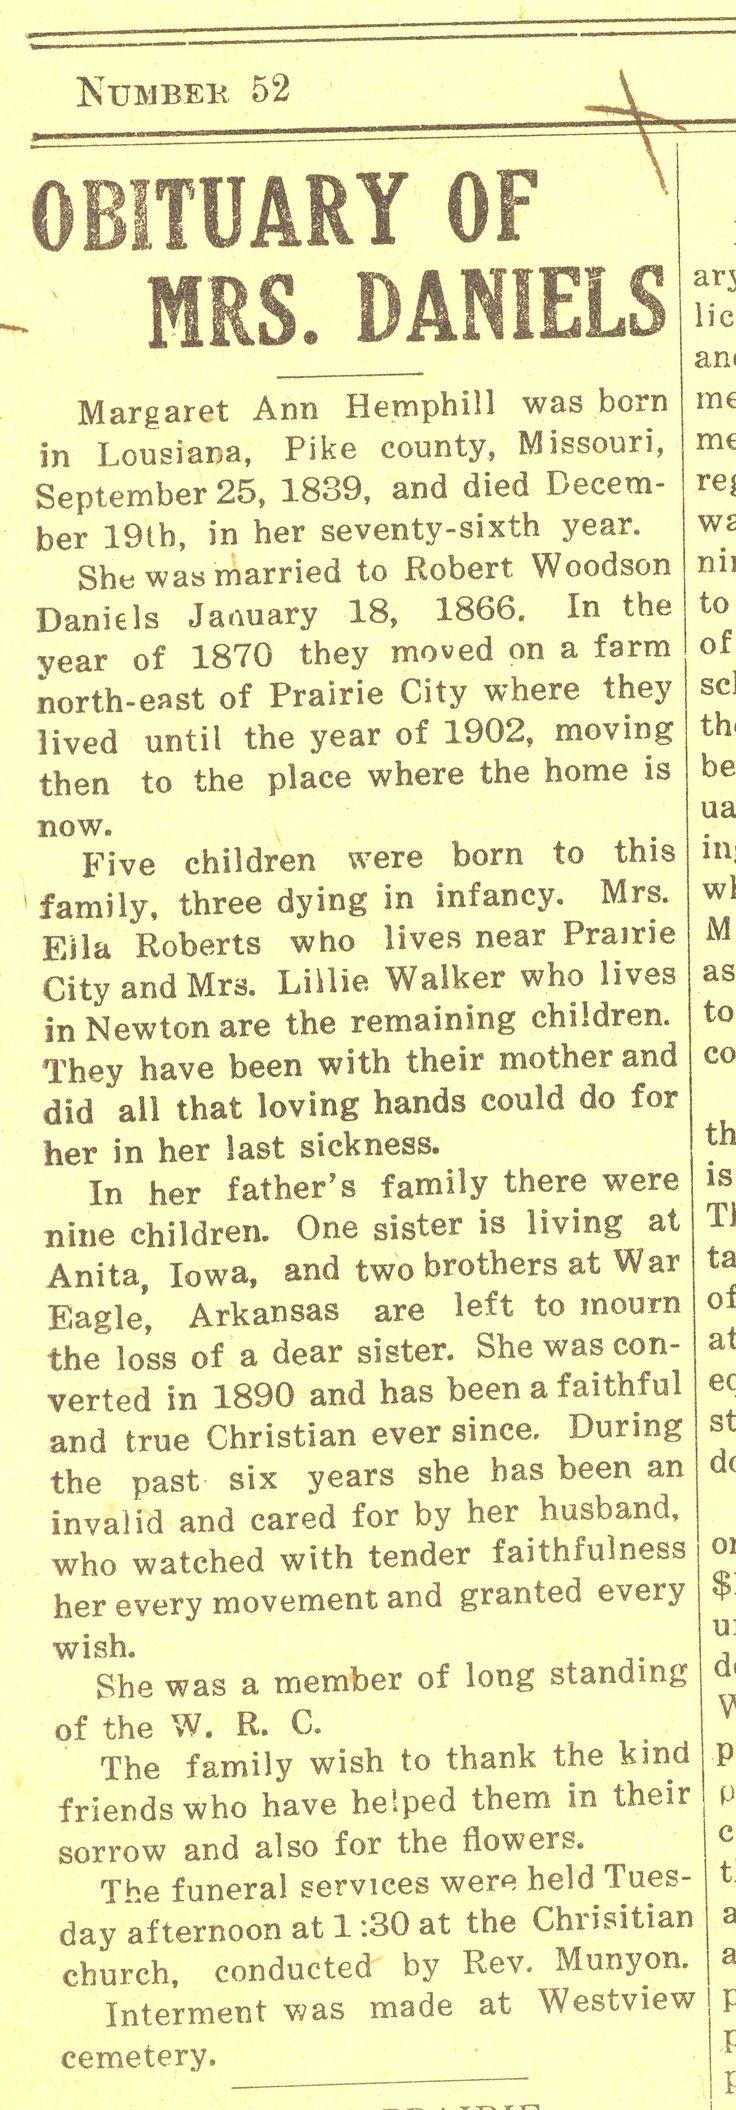 Obituary of Margaret Ann Hemphill, 23 December 1915, Prairie City News, Prairie City, Iowa, page 1. #Genealogy #Family History